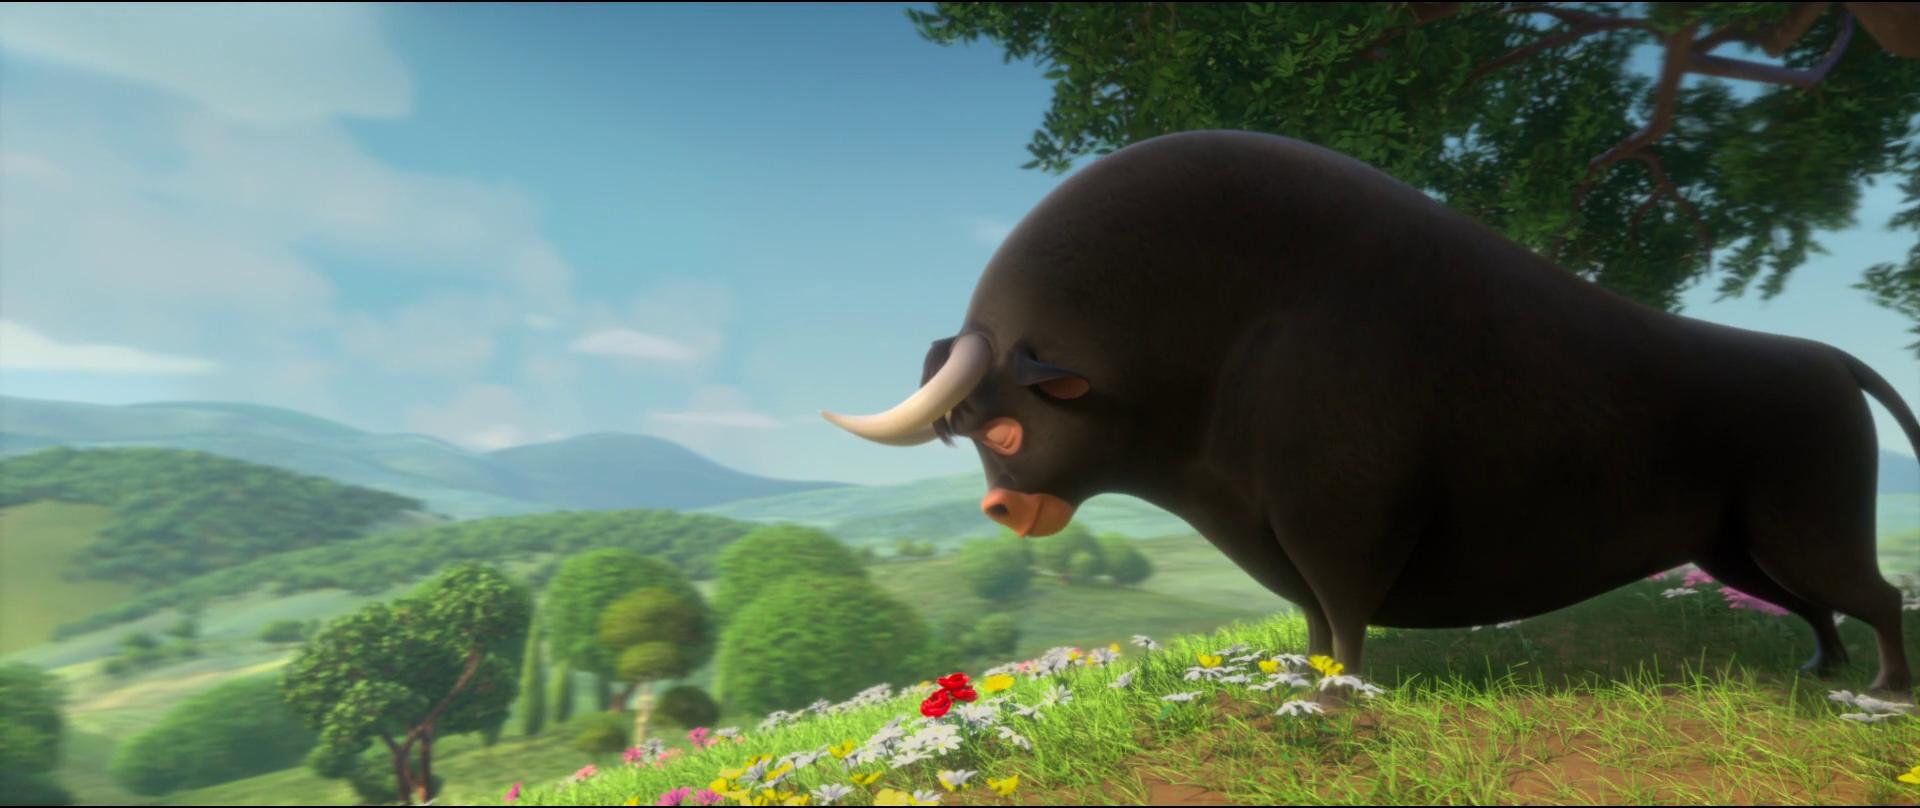 Ferdinand (2017) 1080p BluRay DTS x264-DRONES